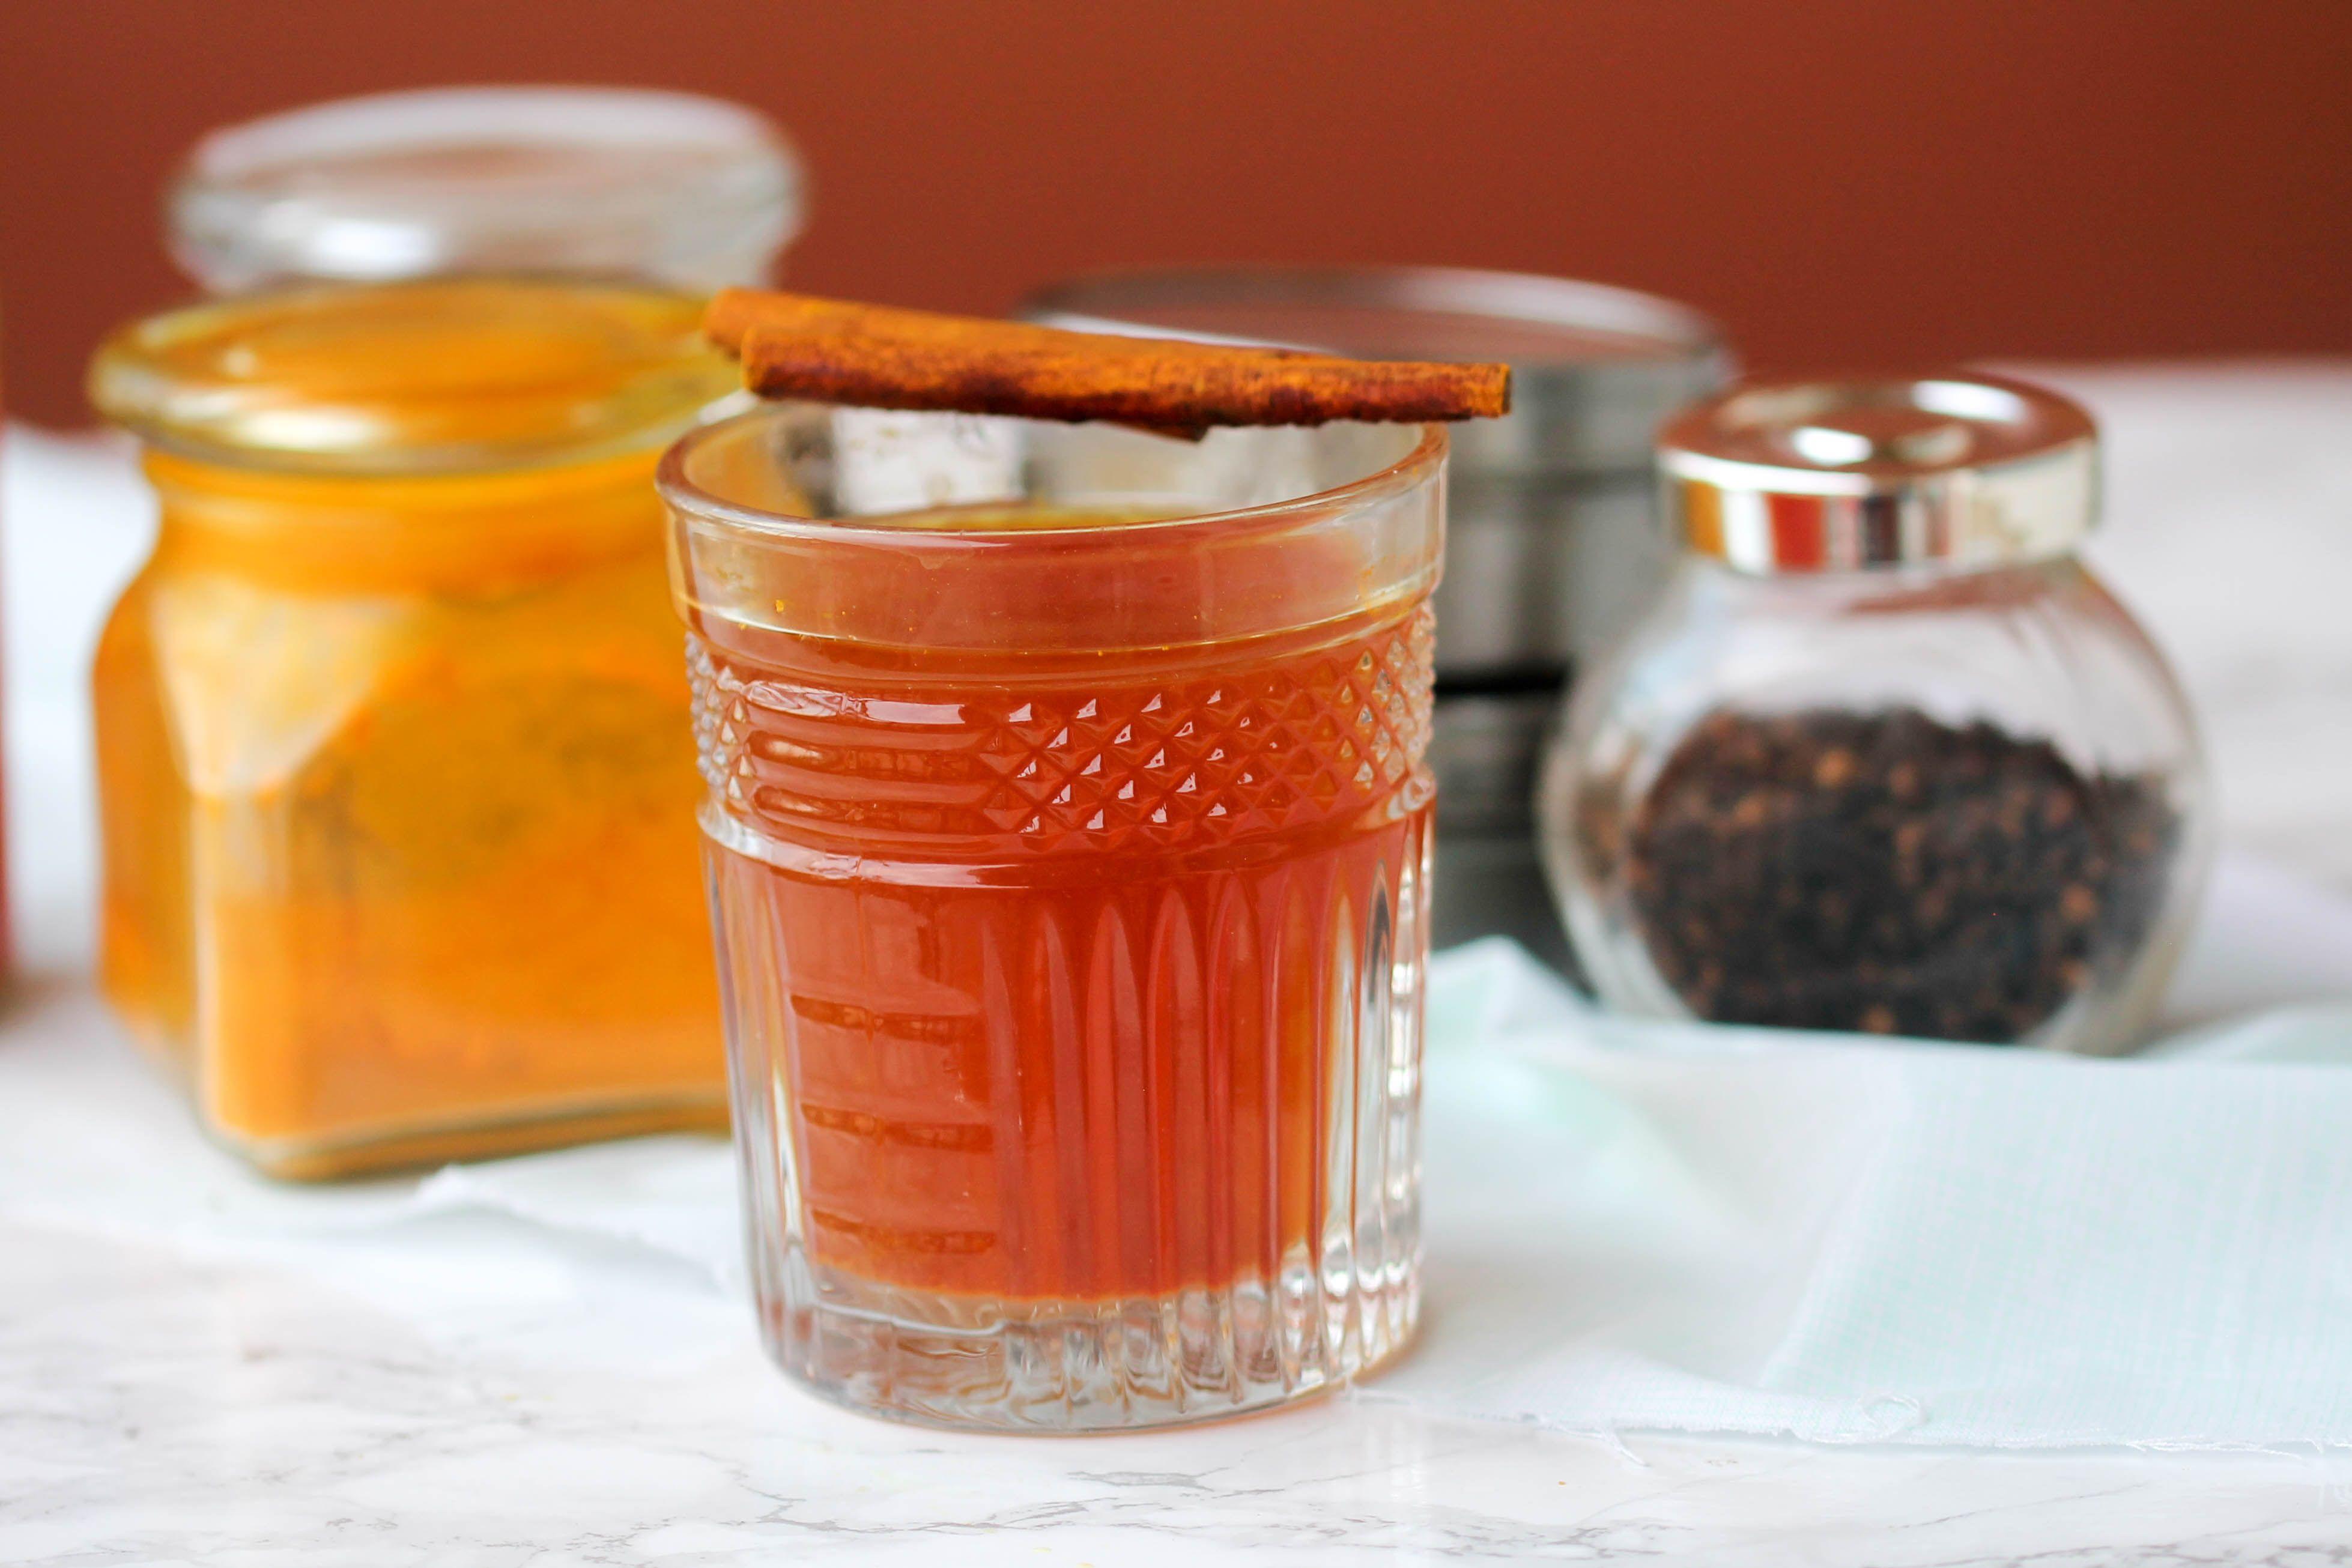 Homemade cold tonic food pleasure health recipe